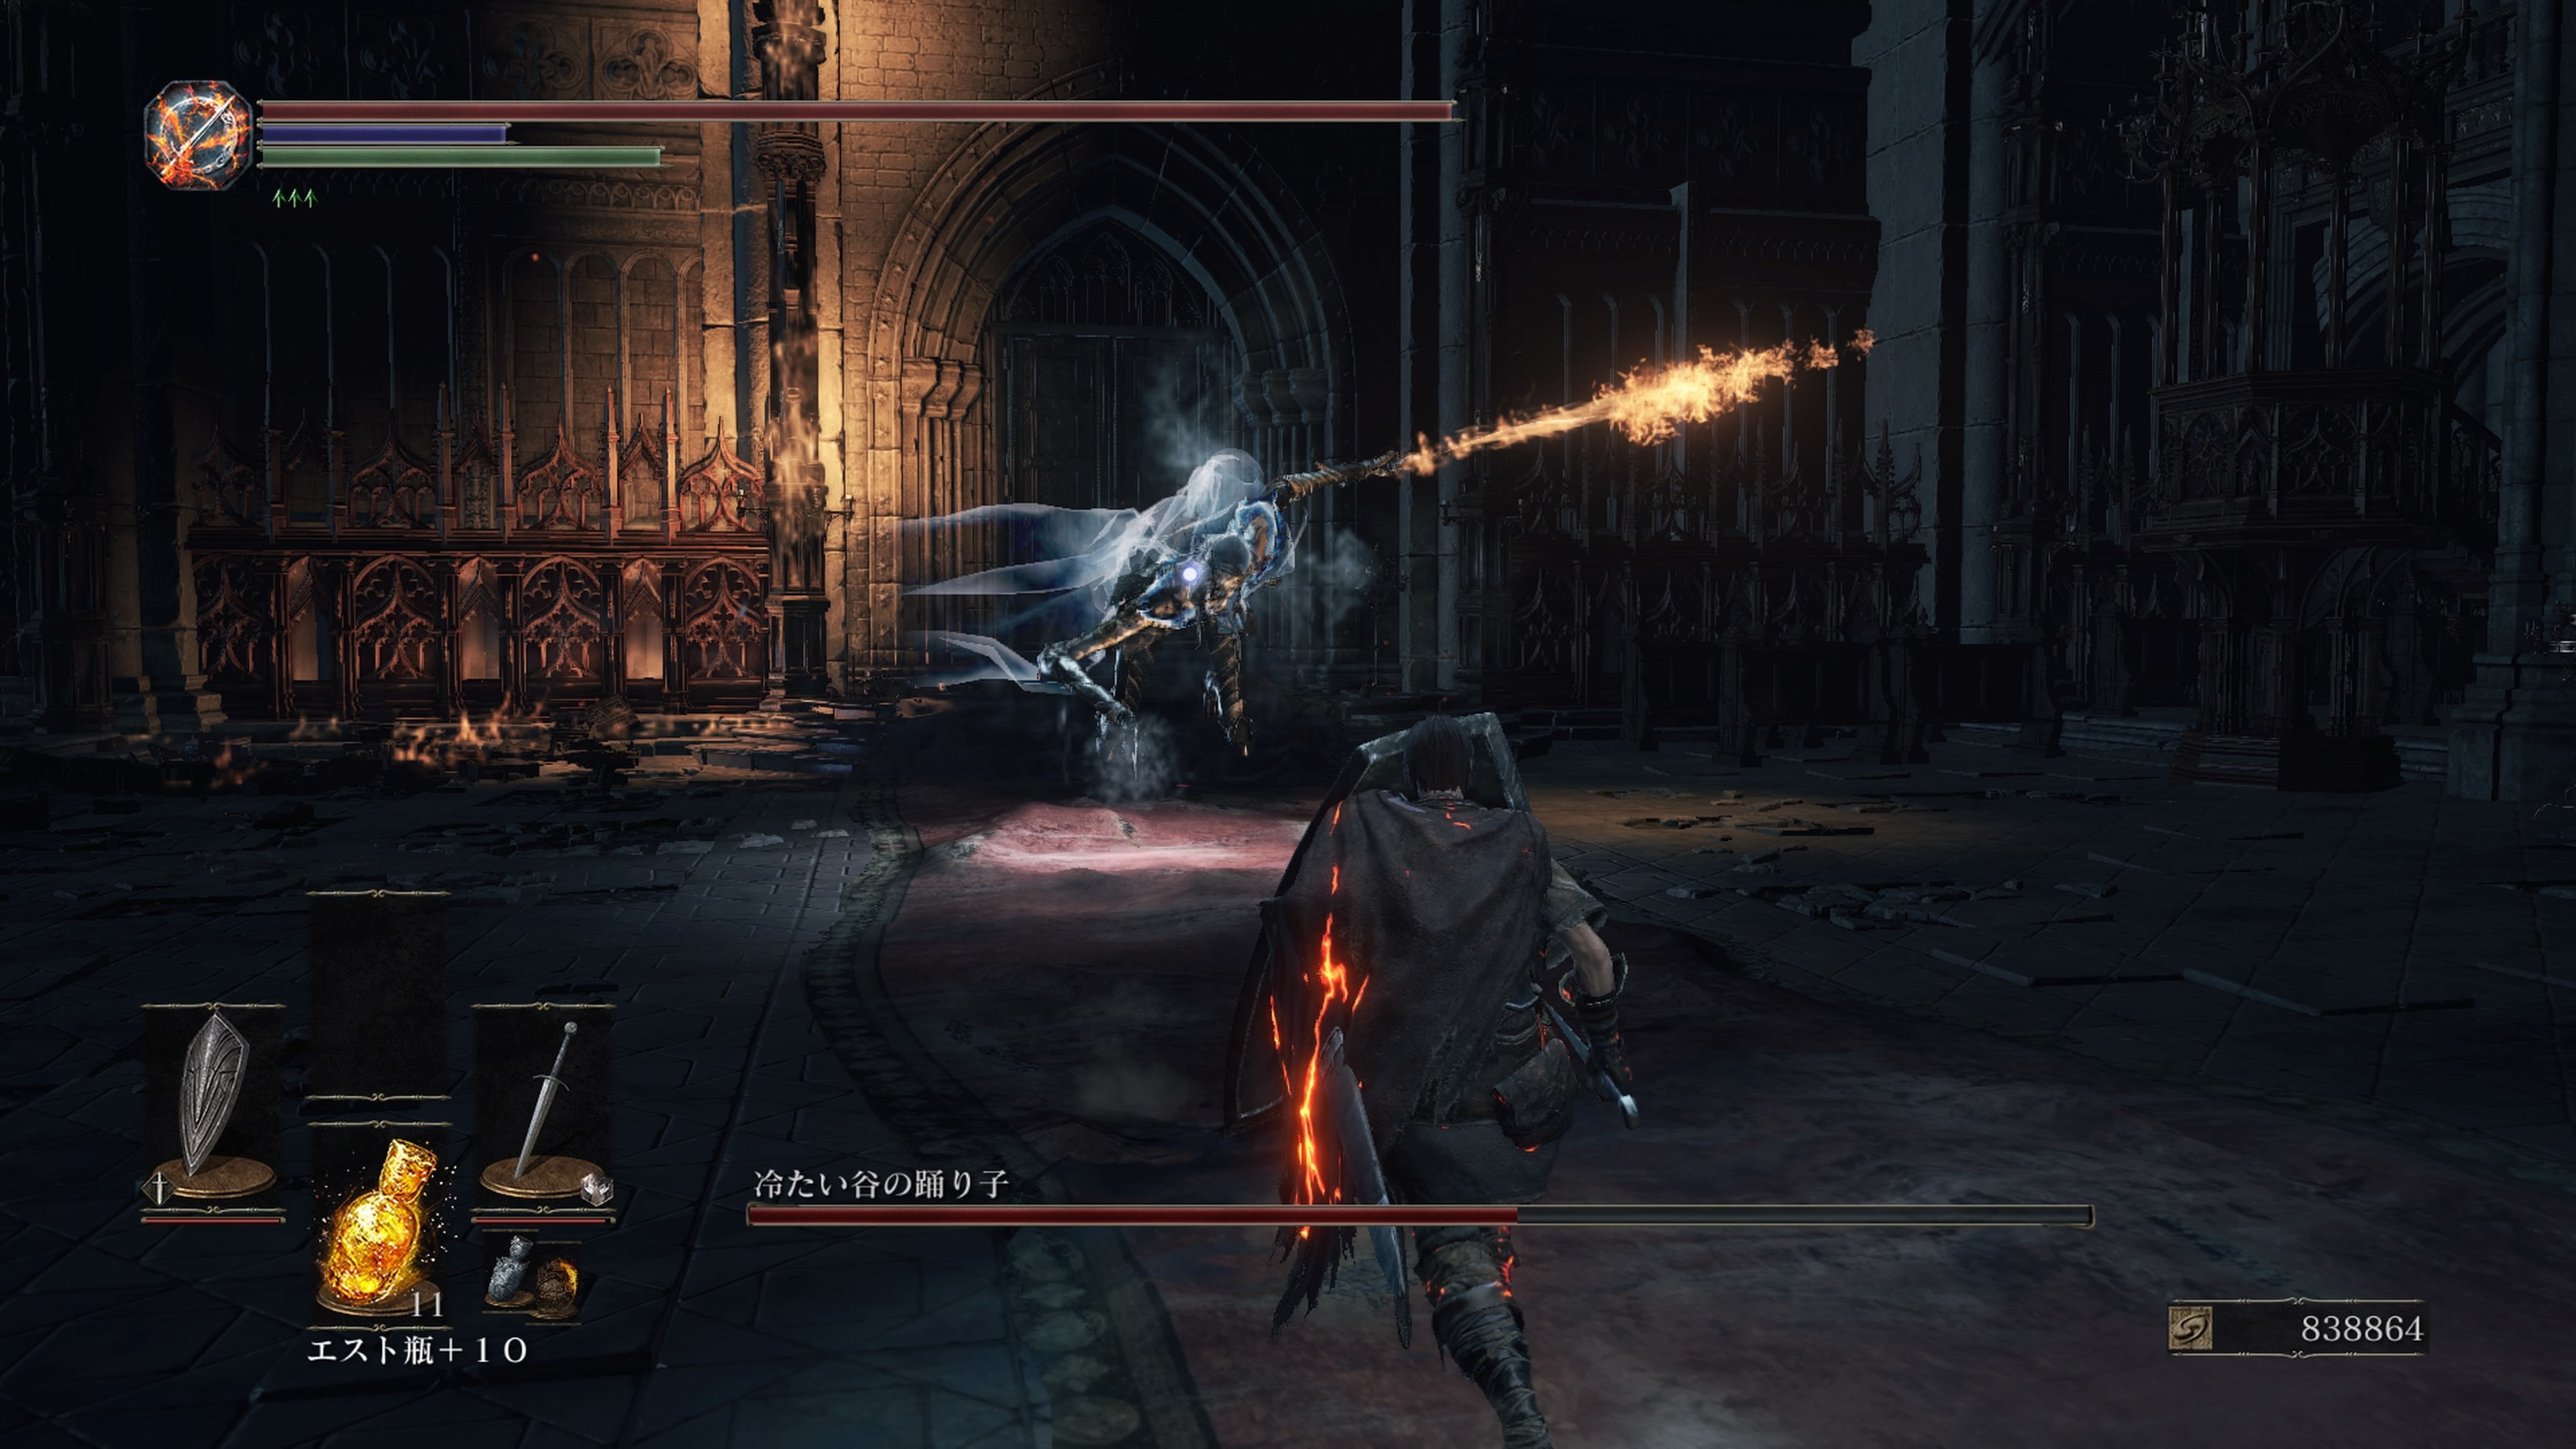 dark soul ダークソウル3 三大欲求よりゲーム欲求が強い